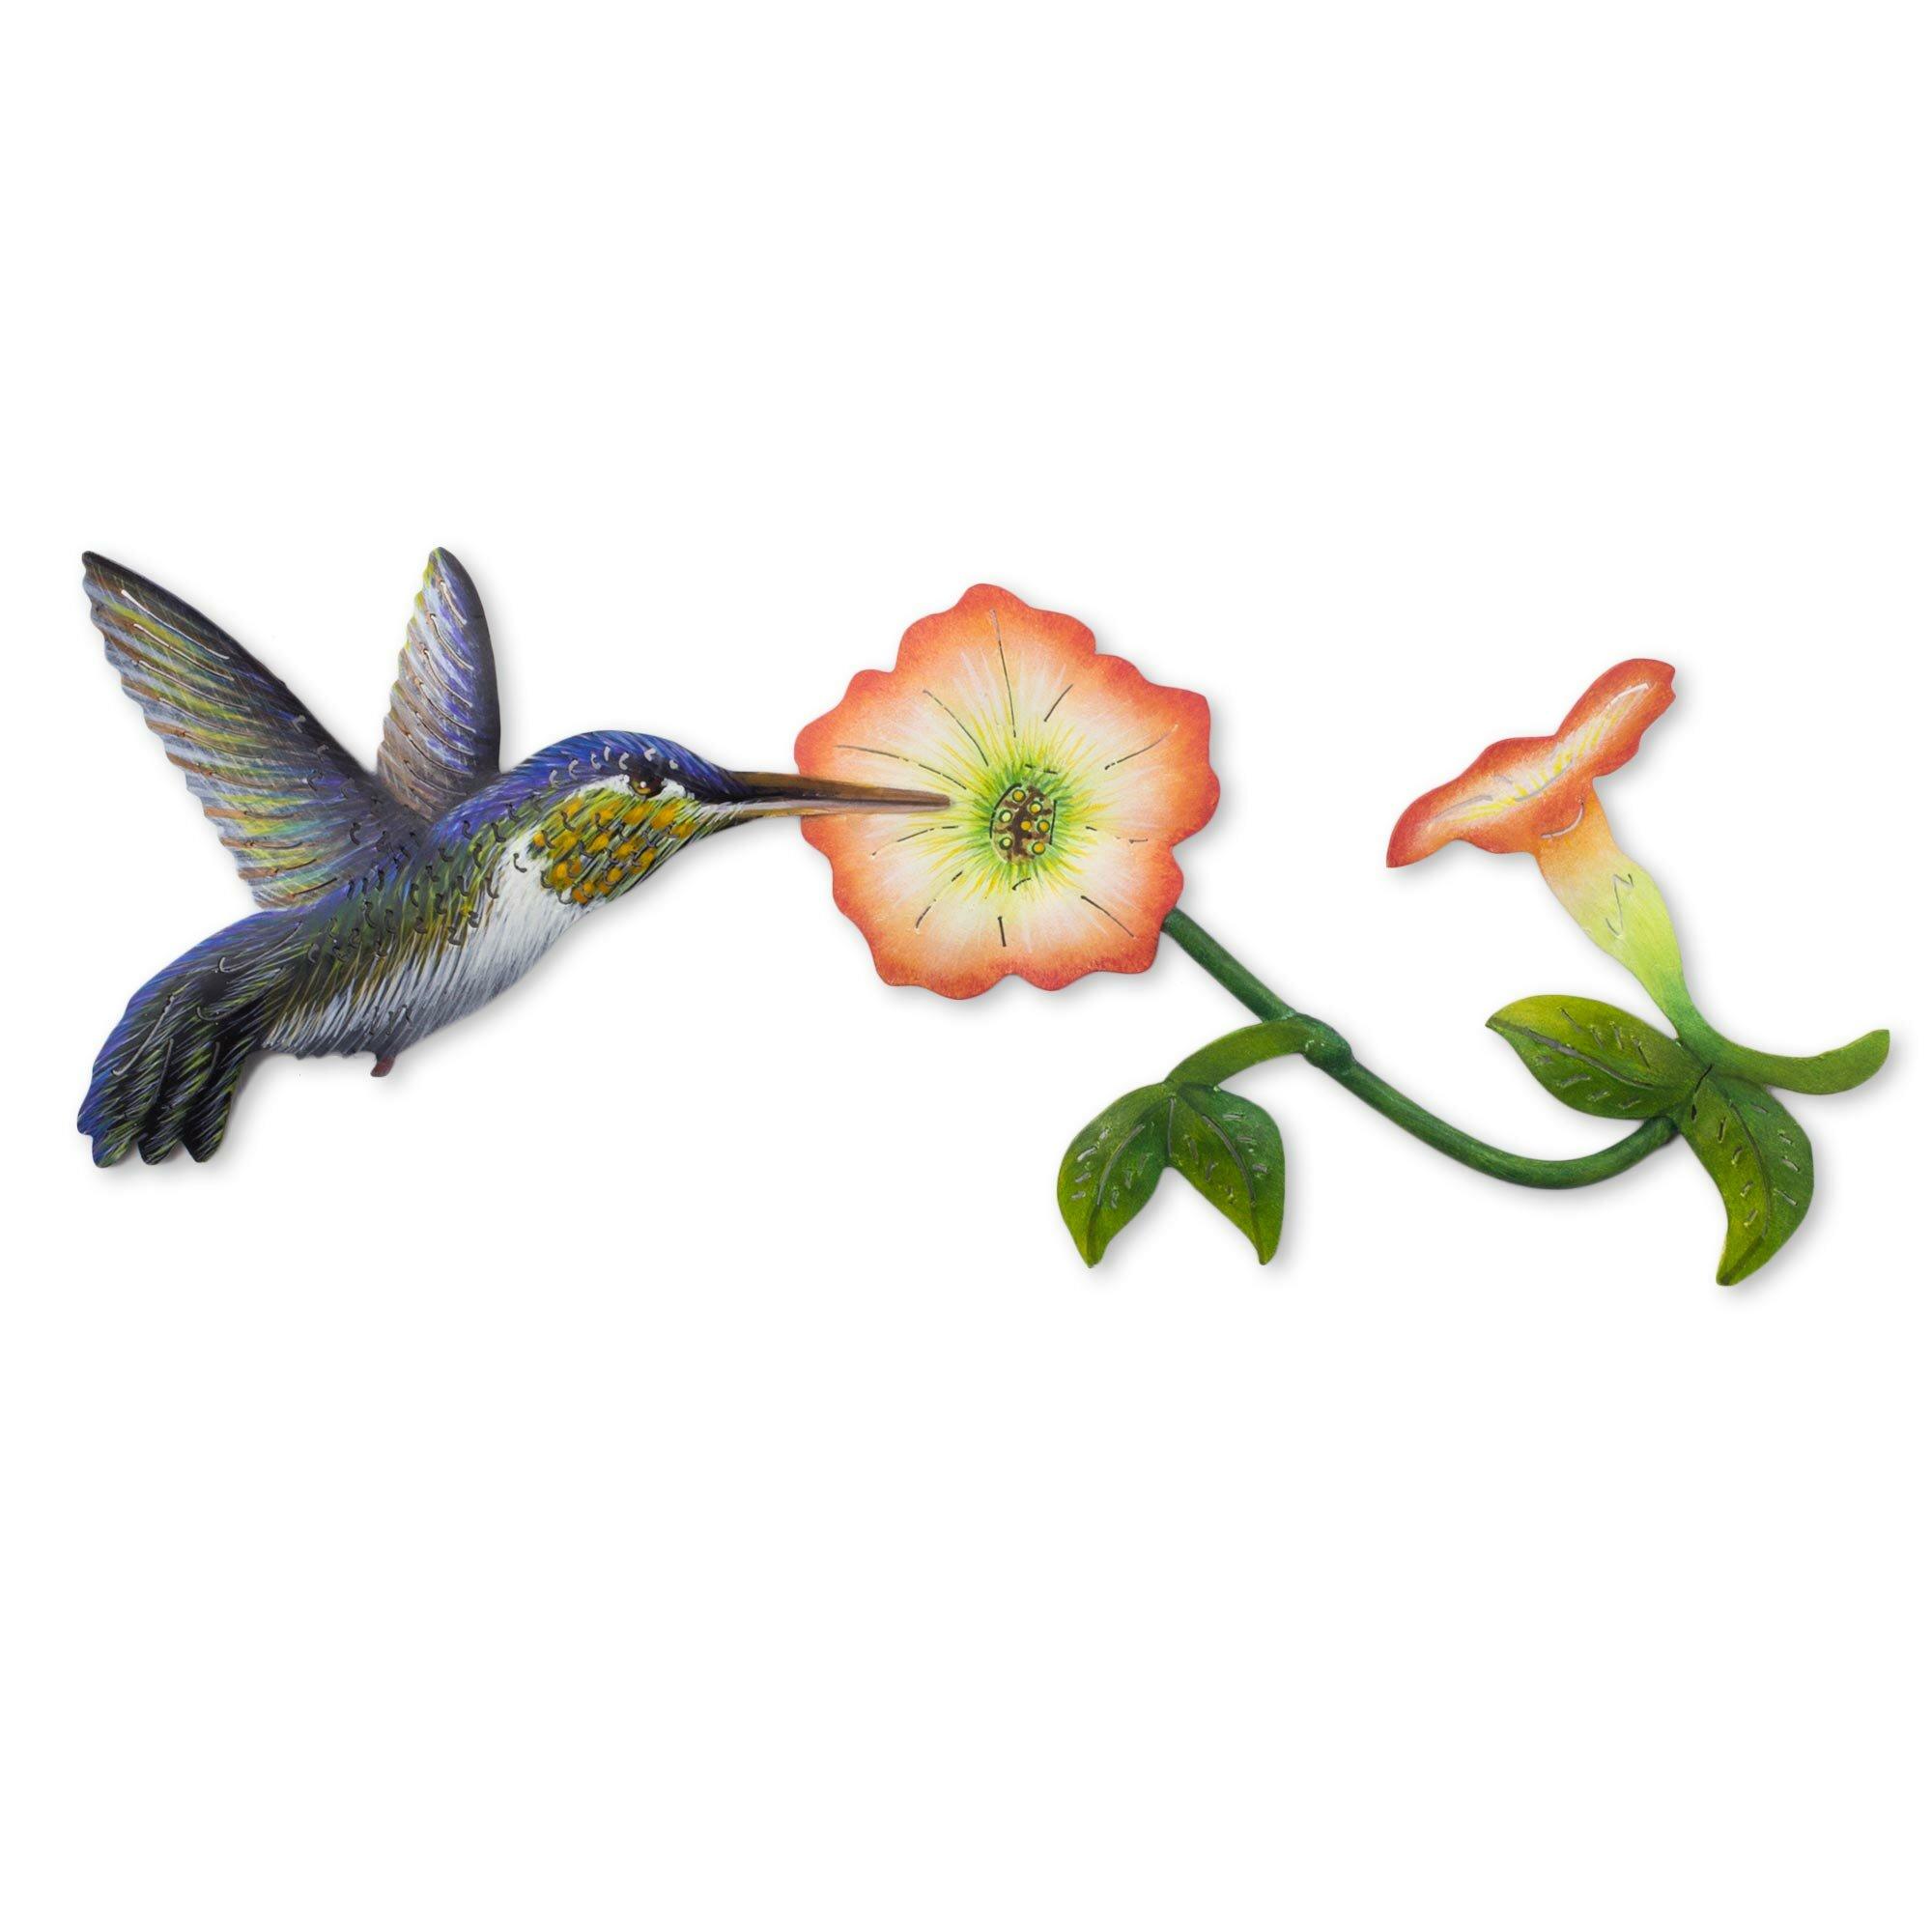 Top 28 Hummingbird Decorations Hummingbird Home Decor 28 Images Hummingbird Decor